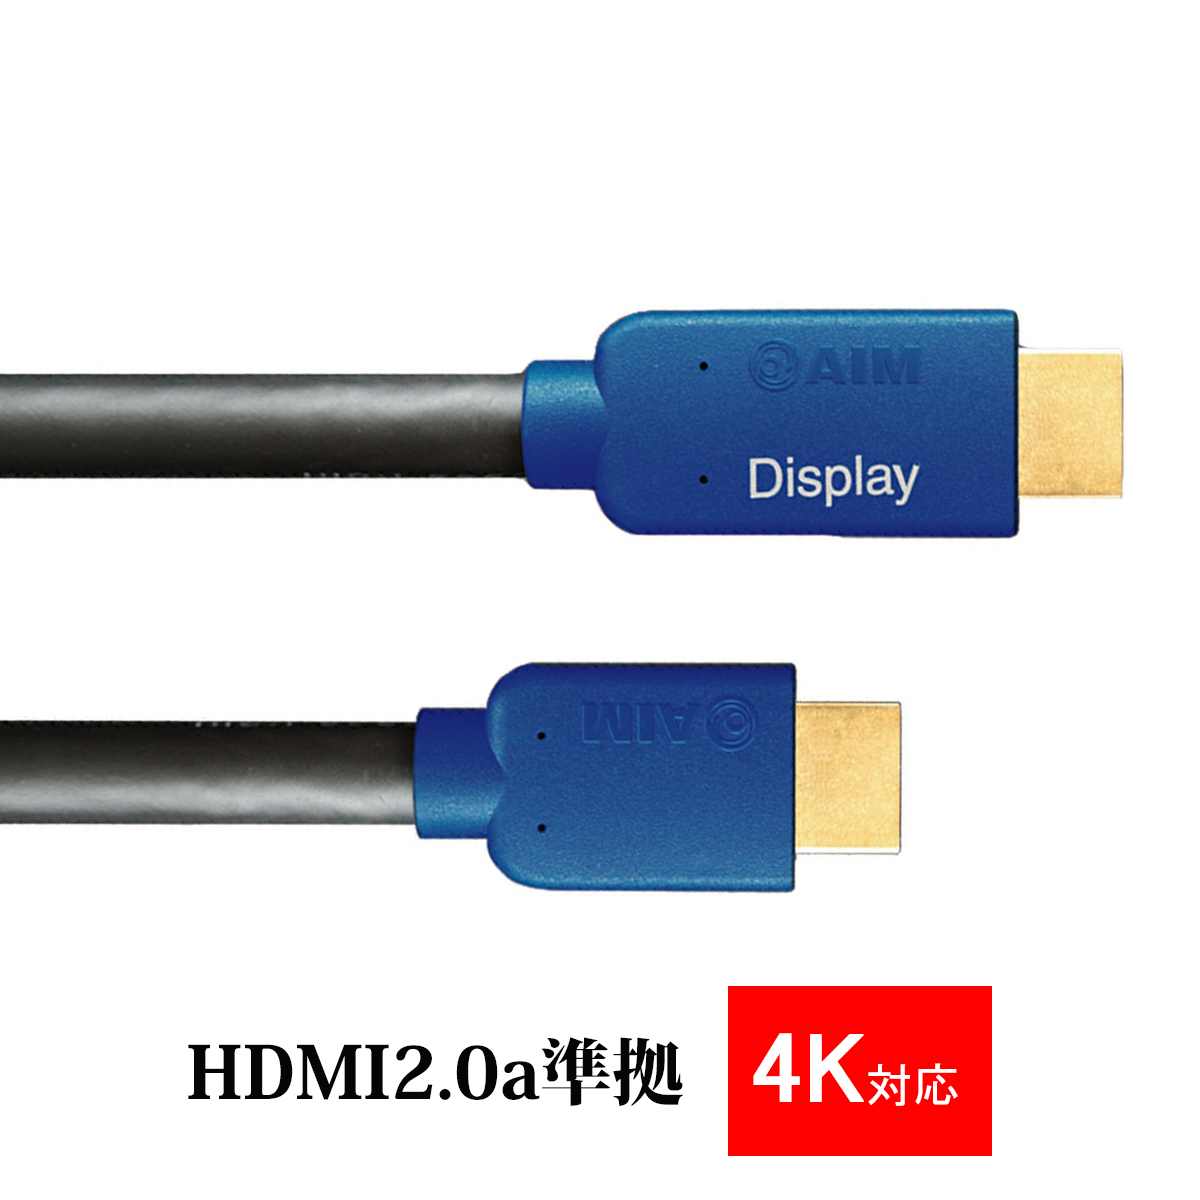 PAVA-IM4K-15 エイム HDMI 18Gインストールケーブル(15m) AIM[IM4K-15]